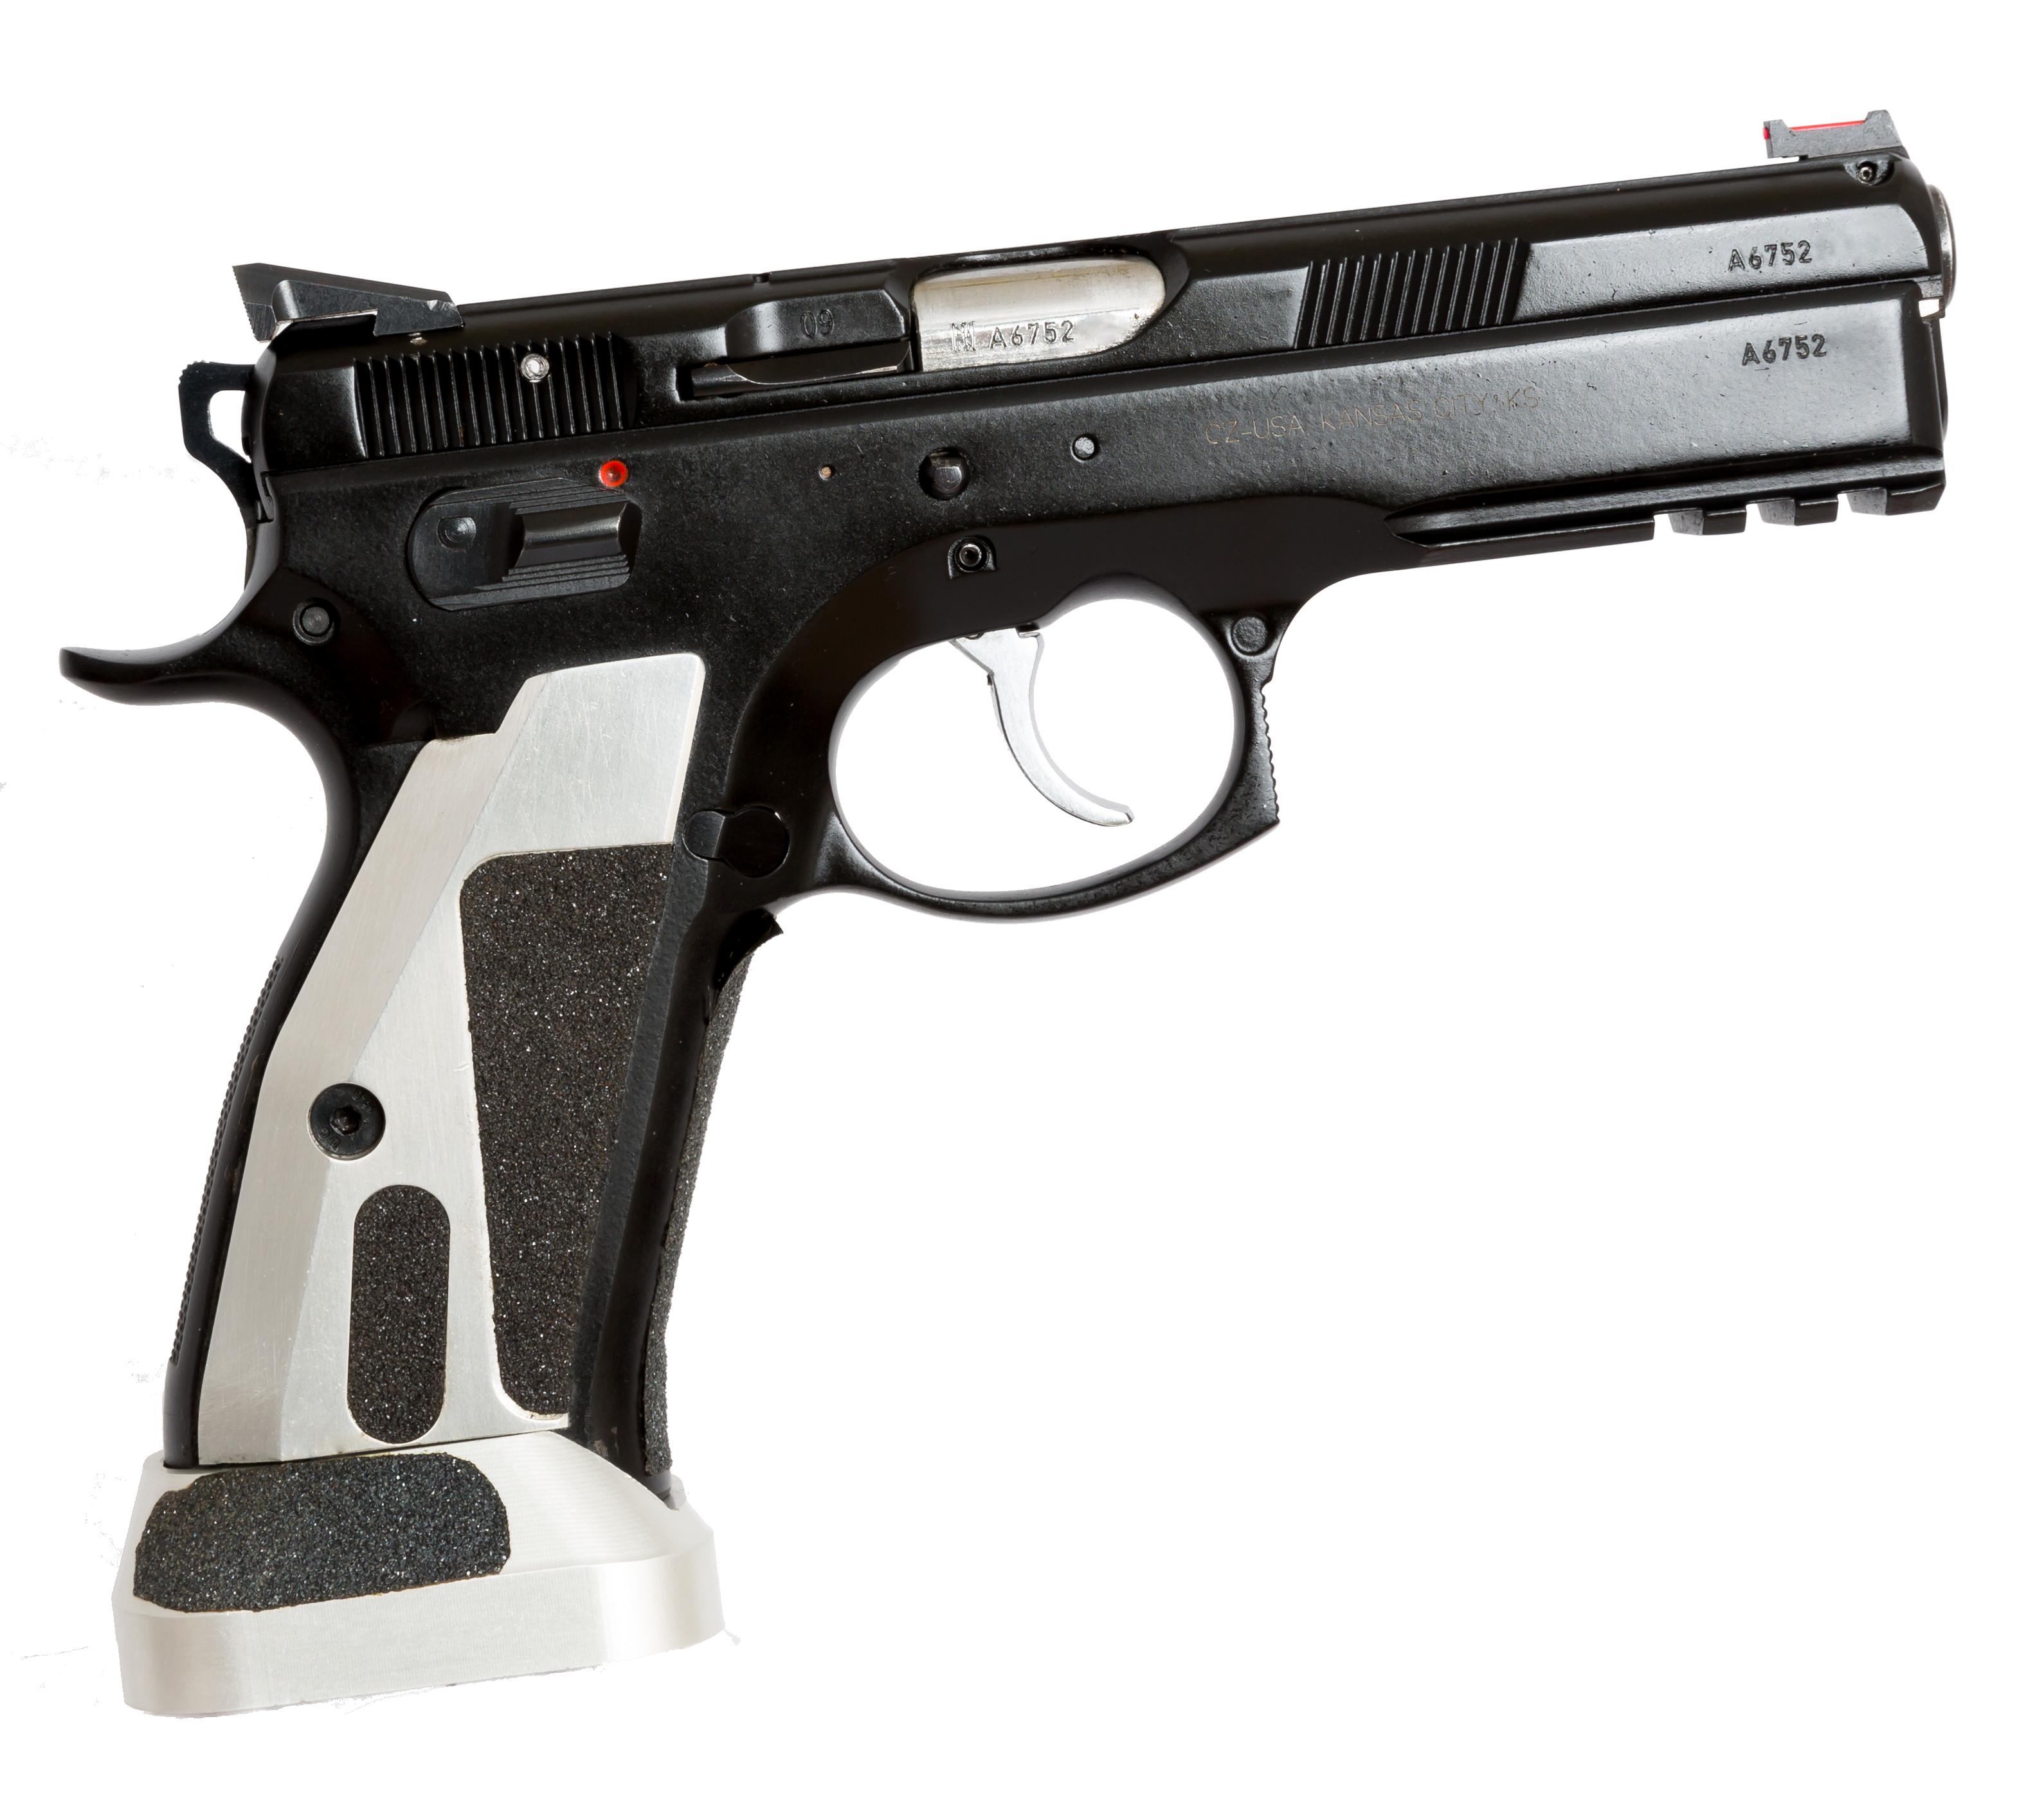 Image result for muzzle brake handgun